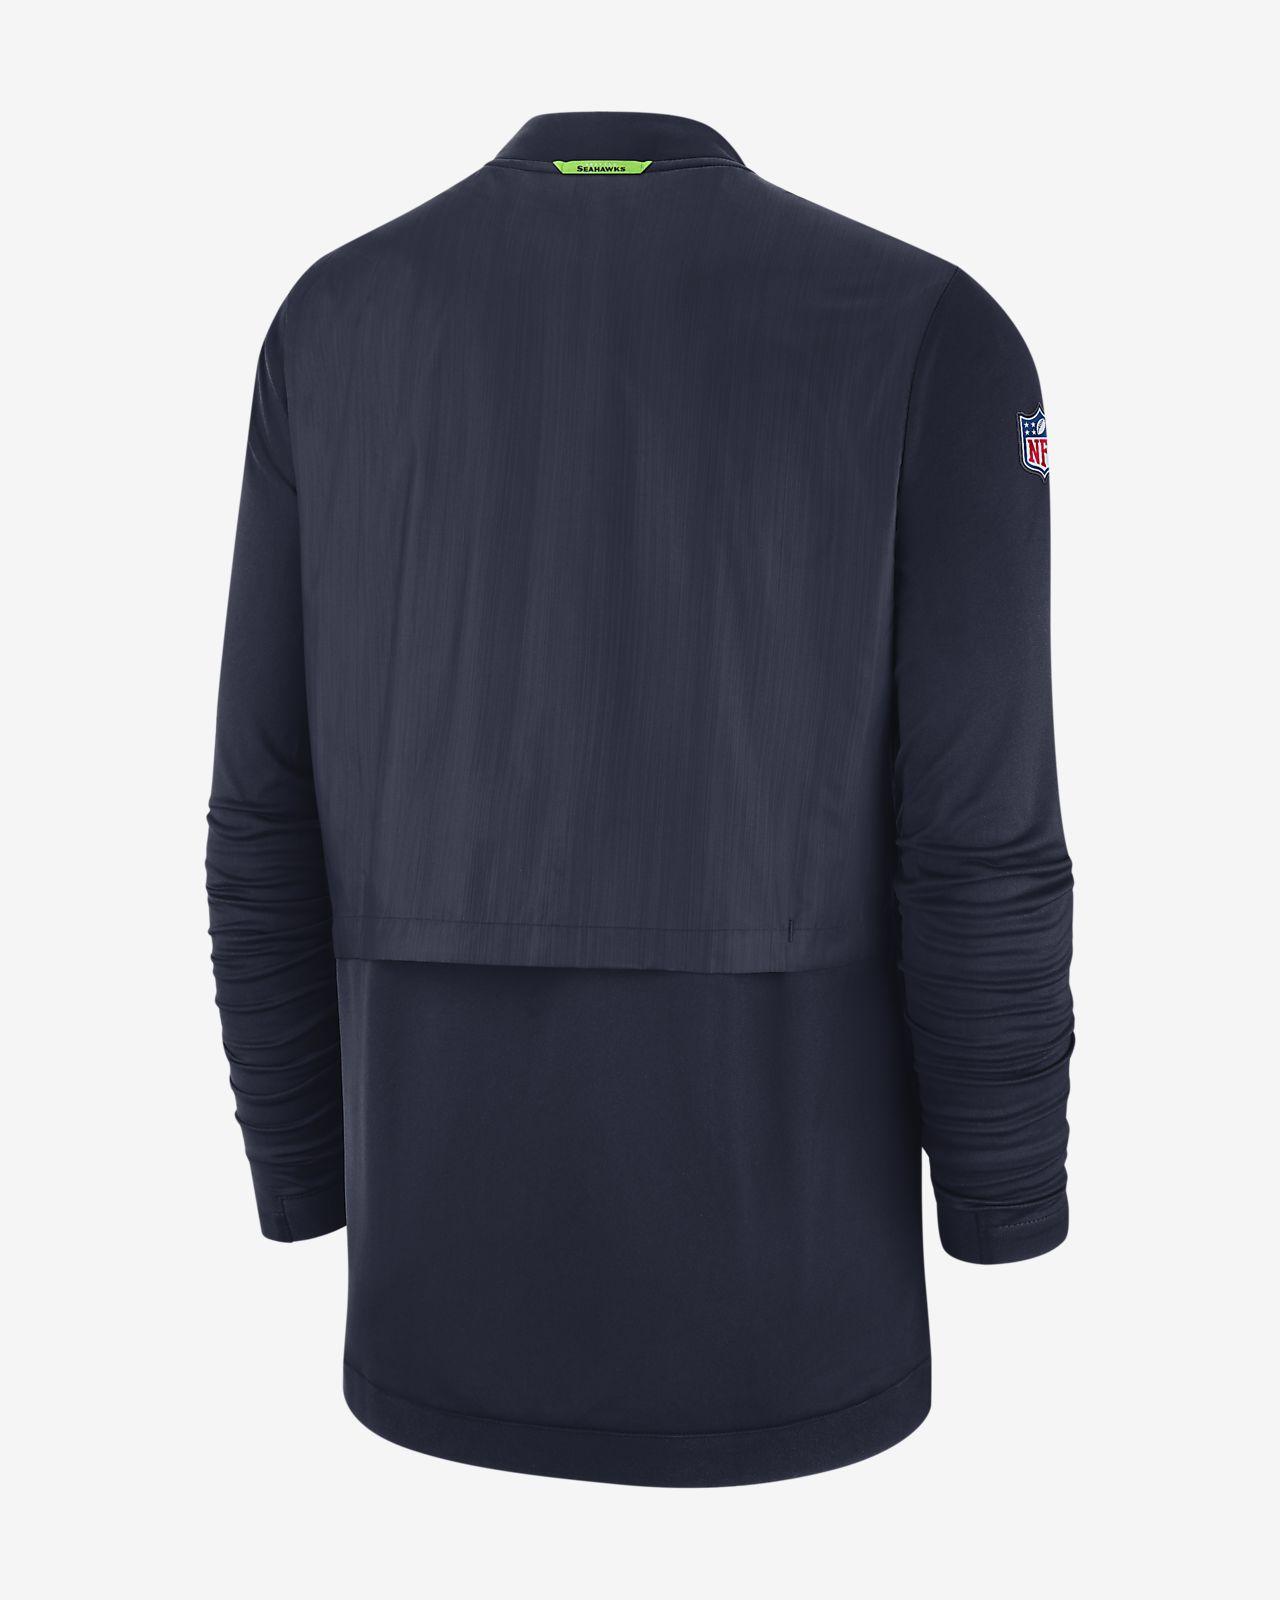 ac1f87e749d9 Nike Elite Hybrid (NFL Seahawks) Men s Full-Zip Jacket. Nike.com